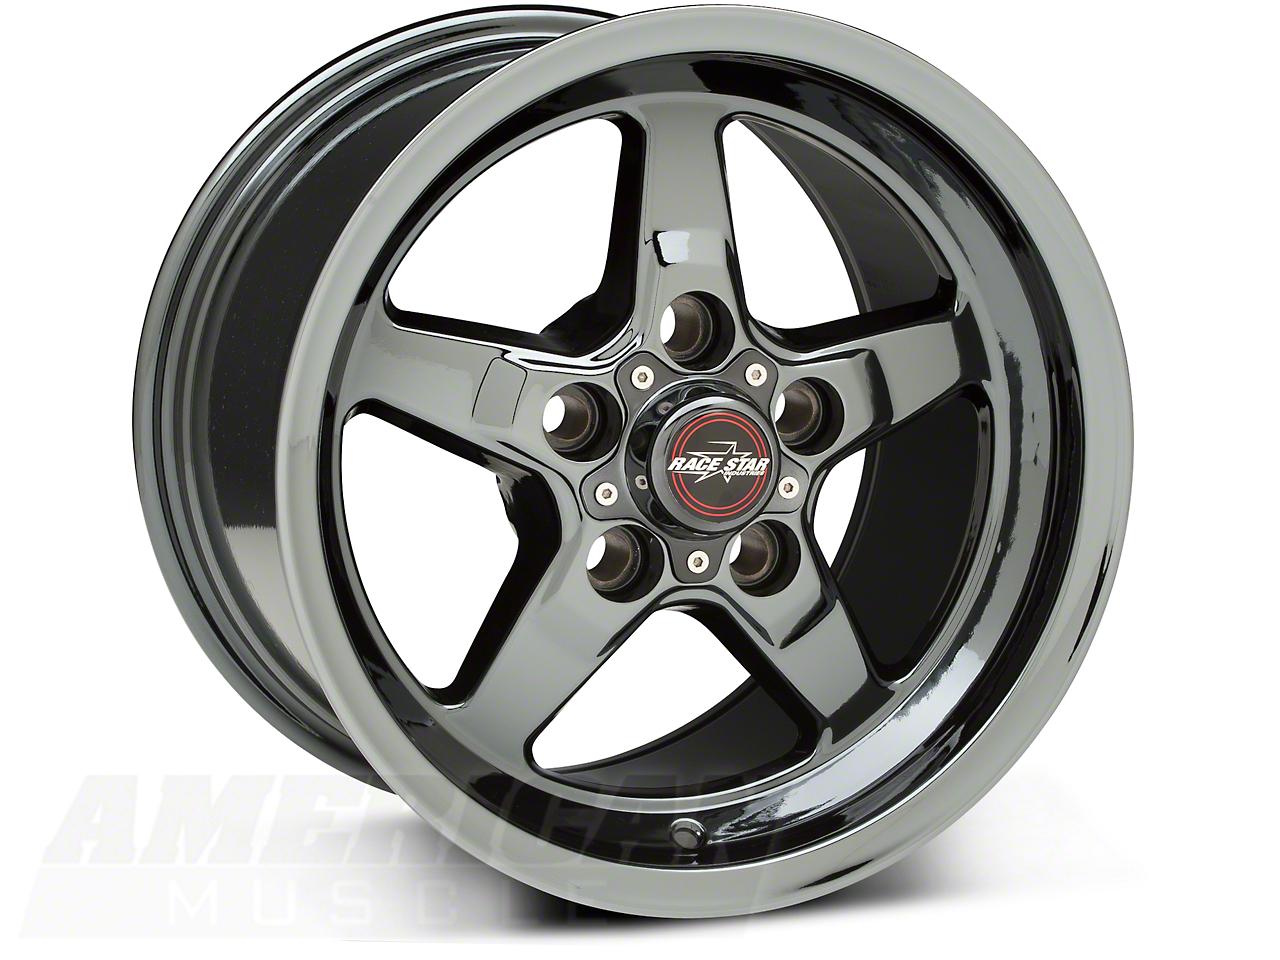 Race Star Dark Star Drag Wheel - Uni-Lug - 15x10 (05-14 GT, V6)